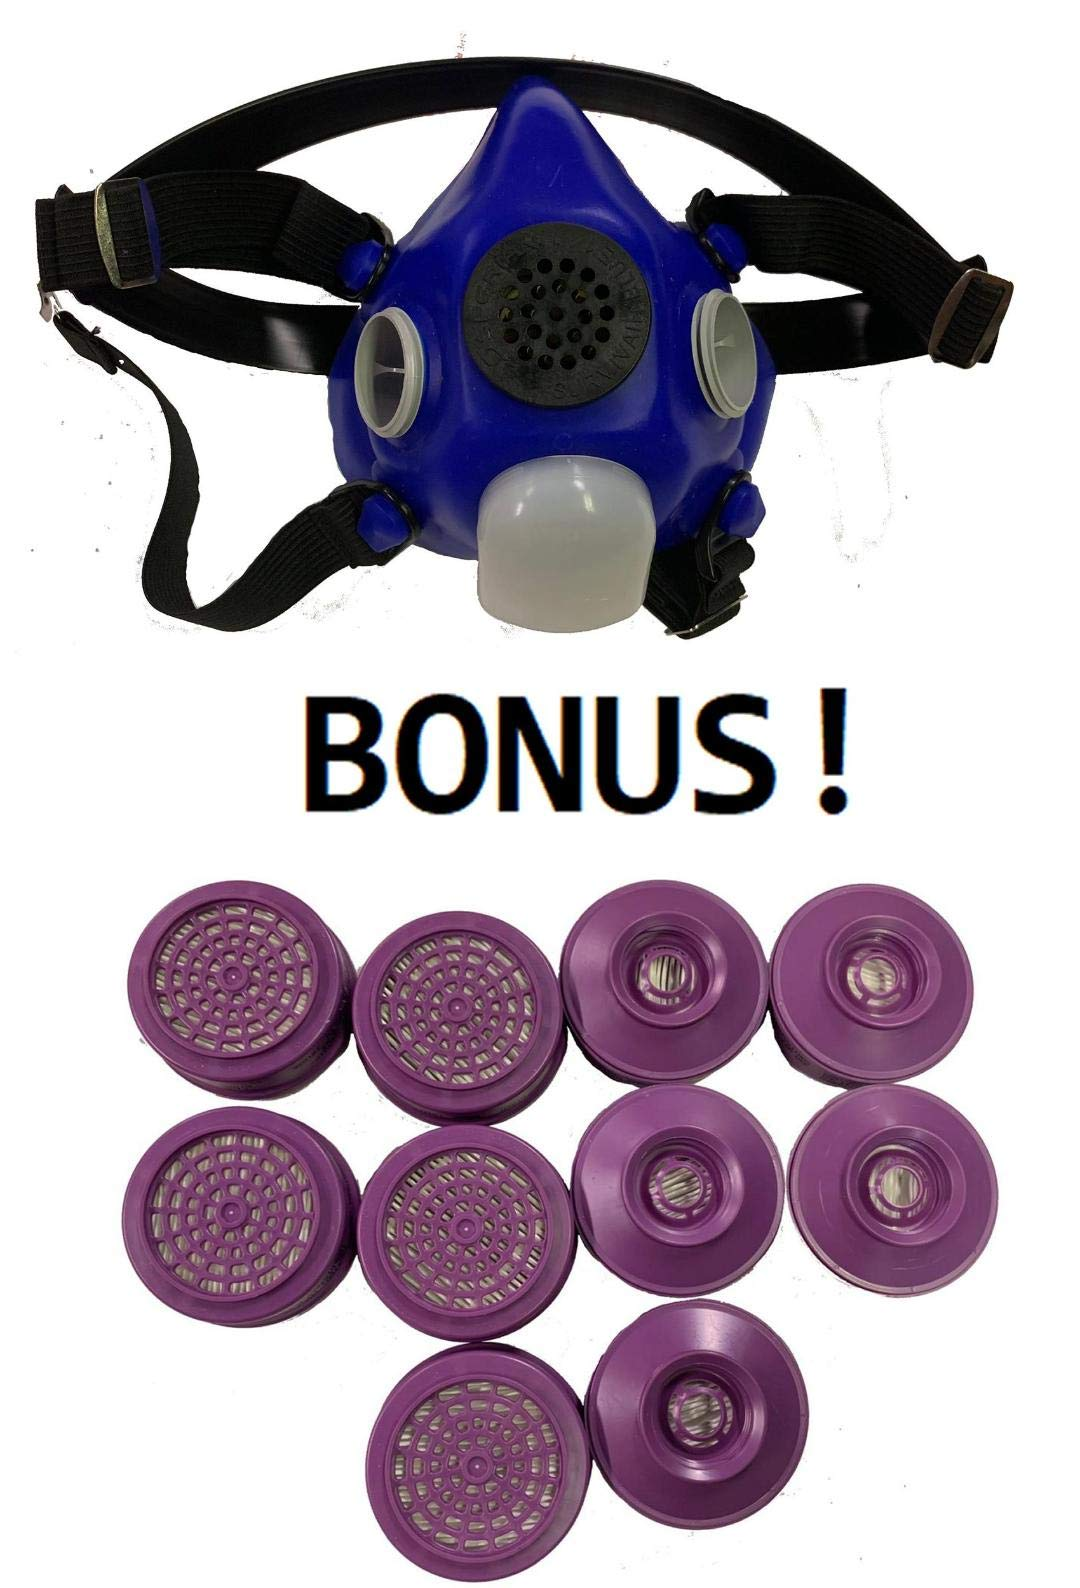 Honeywell P100 Filter For Half Mask Full Face Mask Respirators (10 Each Per Box)